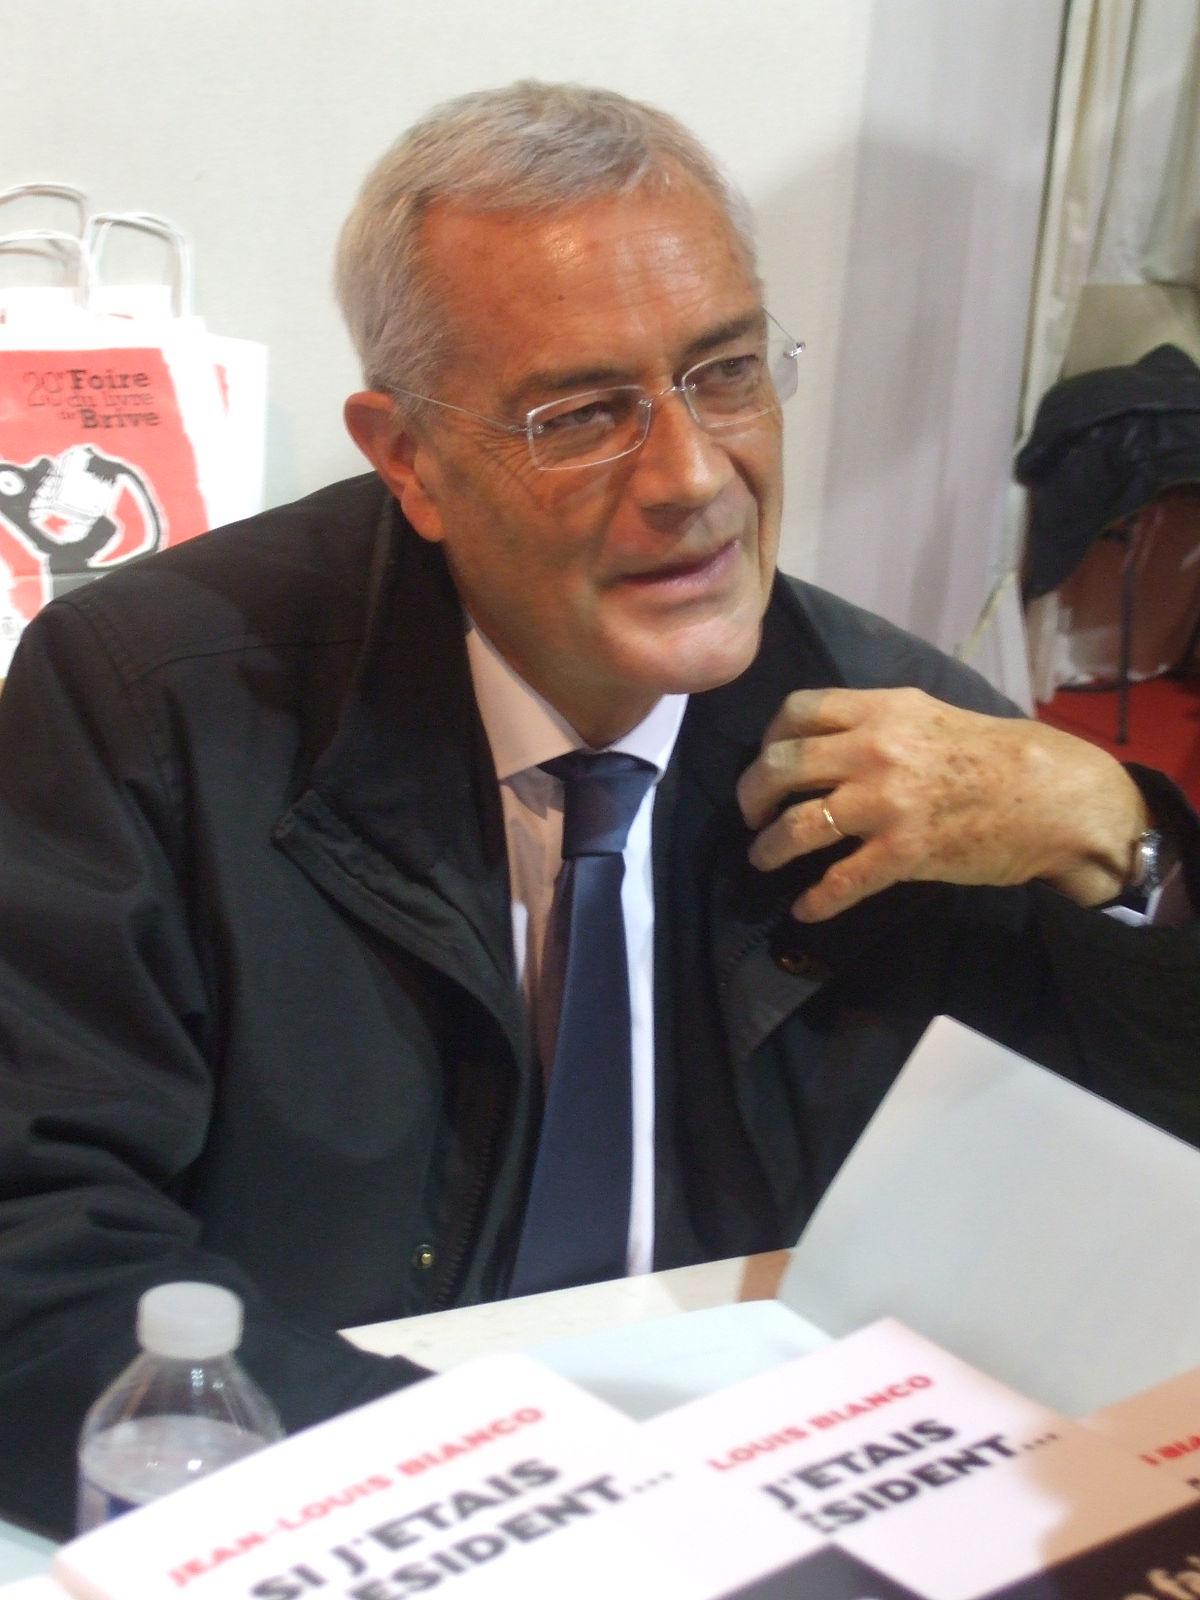 Jean Louis Sabaji Summer 2014: Jean-Louis Bianco